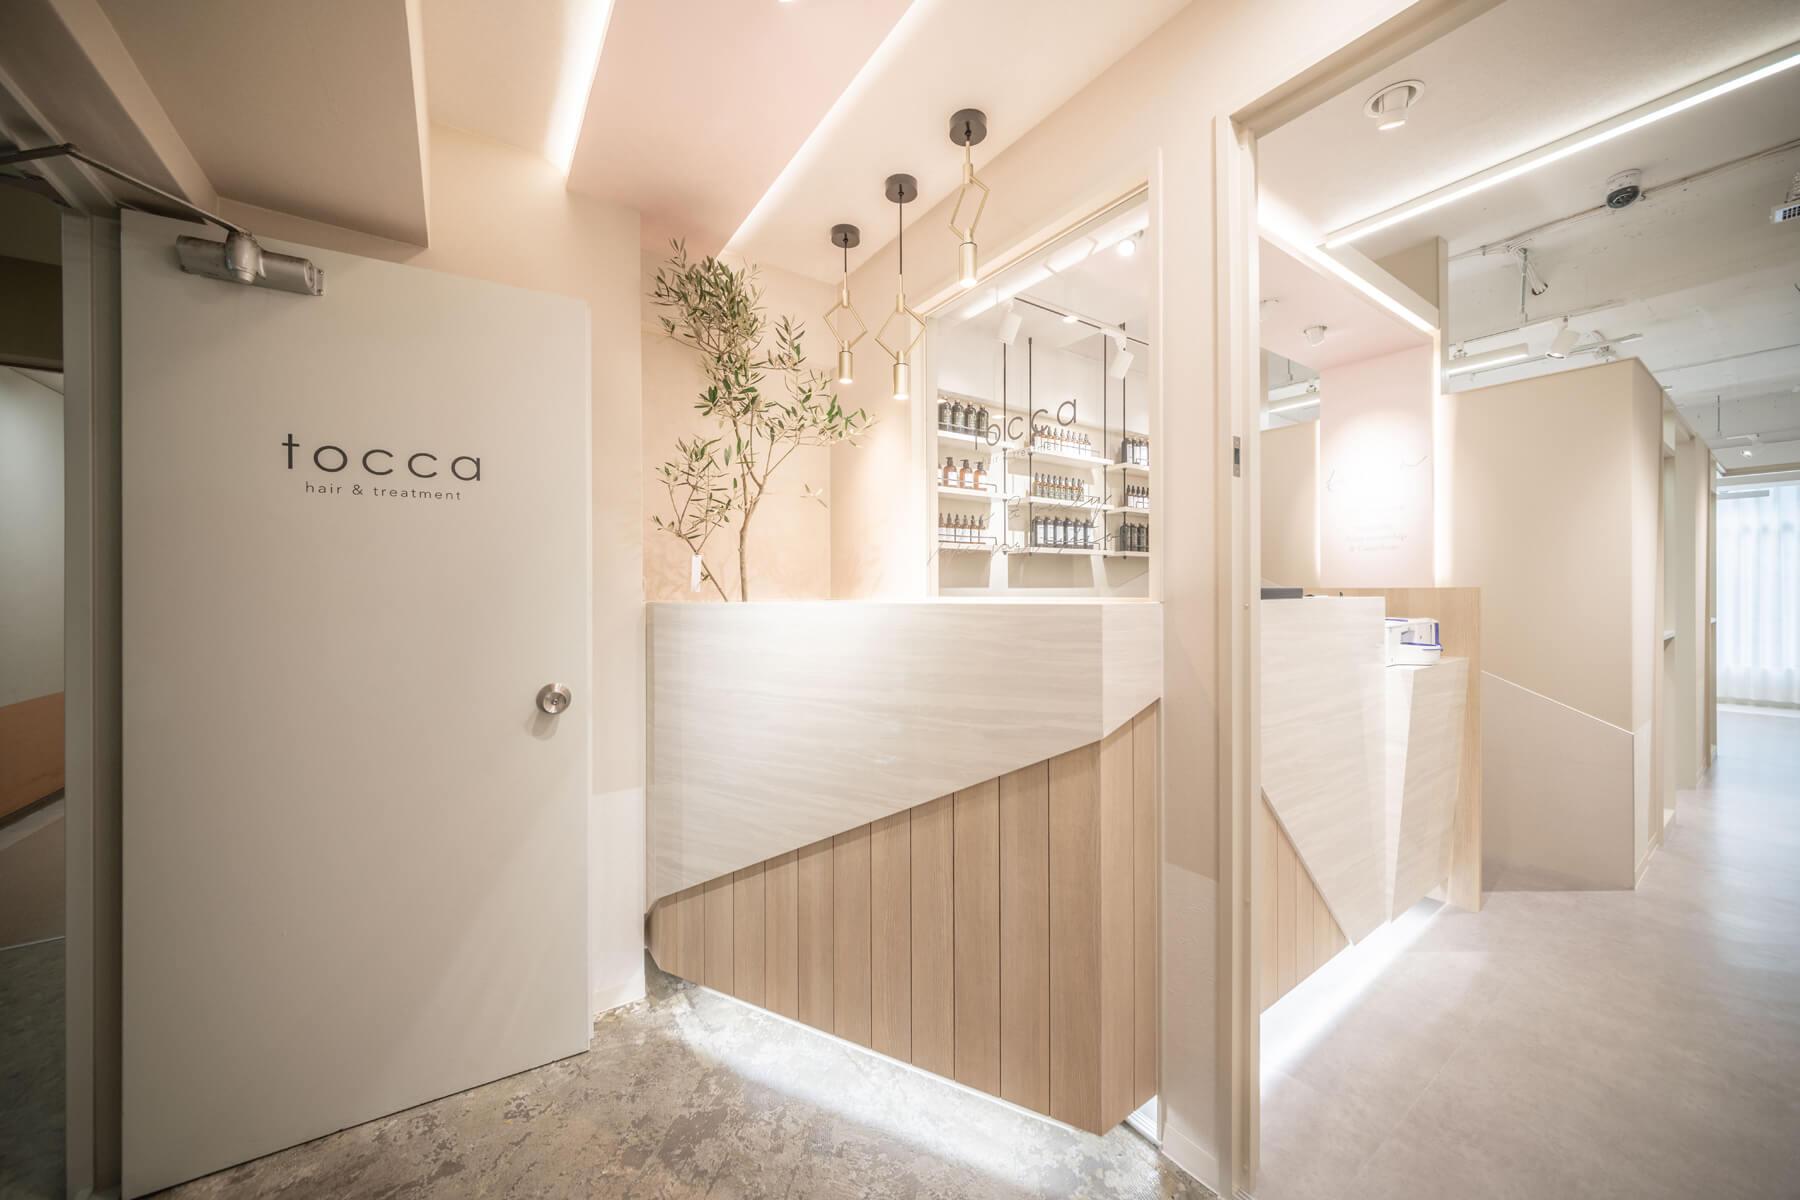 tocca hair&treatment 天神店/Fukuoka